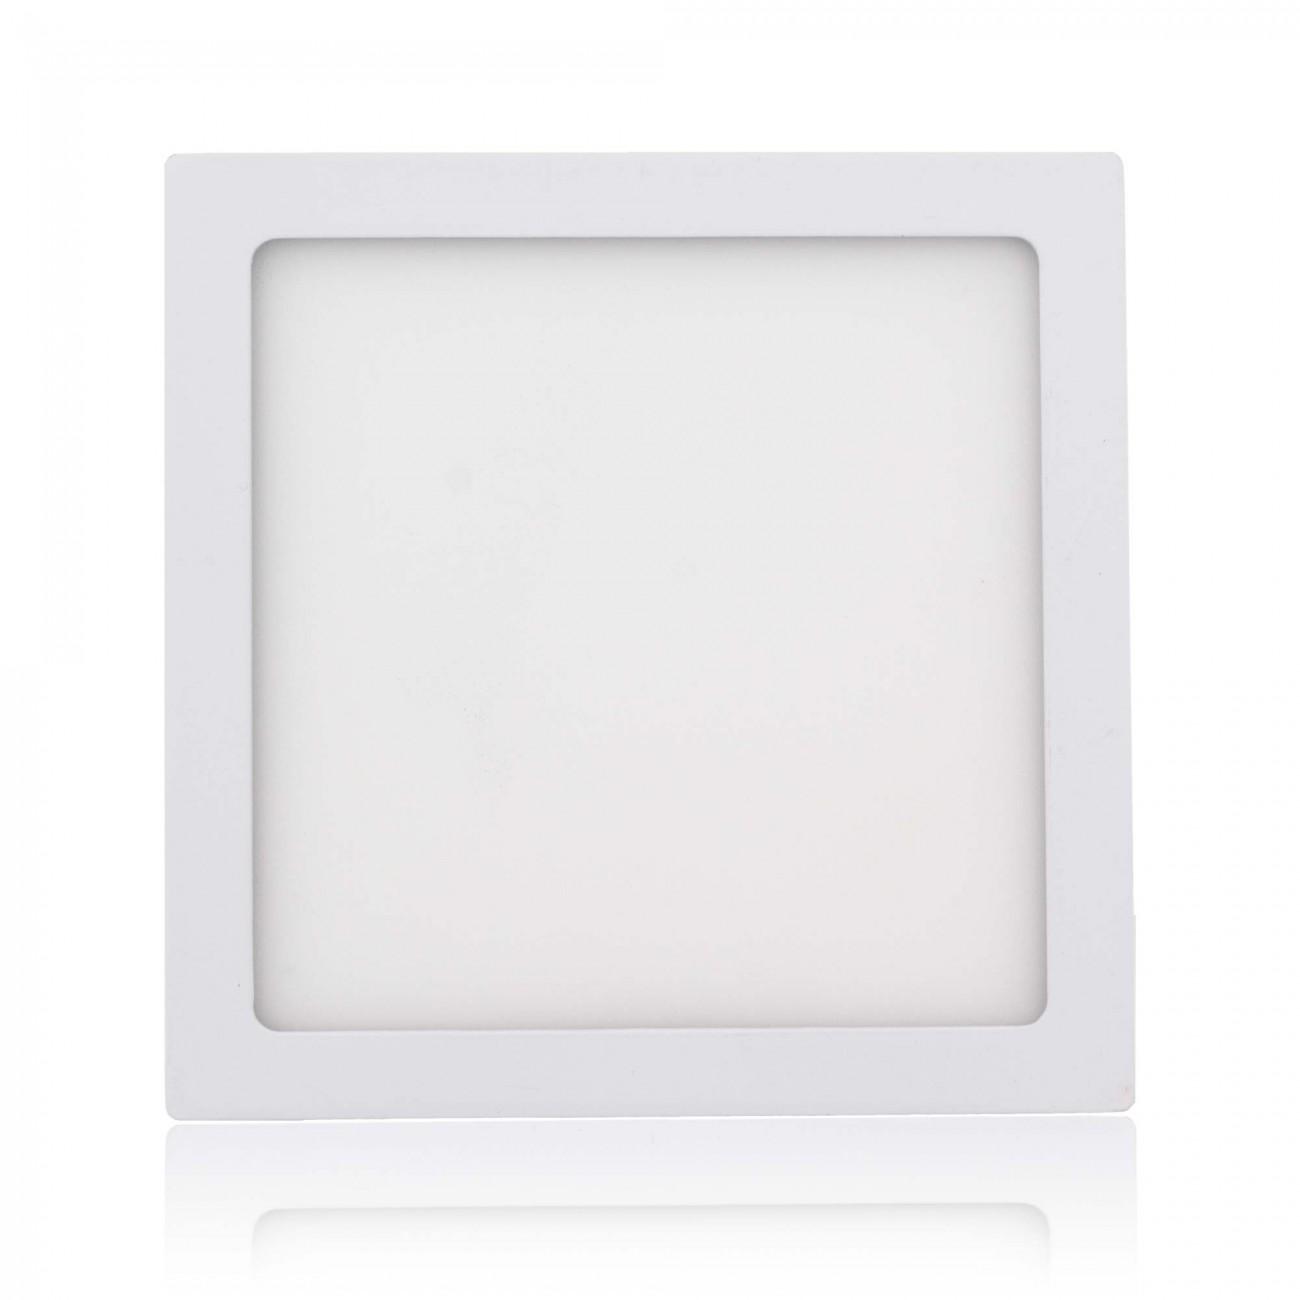 Maxcraft Led Panel Strahler Lampe 18w 225 X 225 Mm Warmweiss Ma